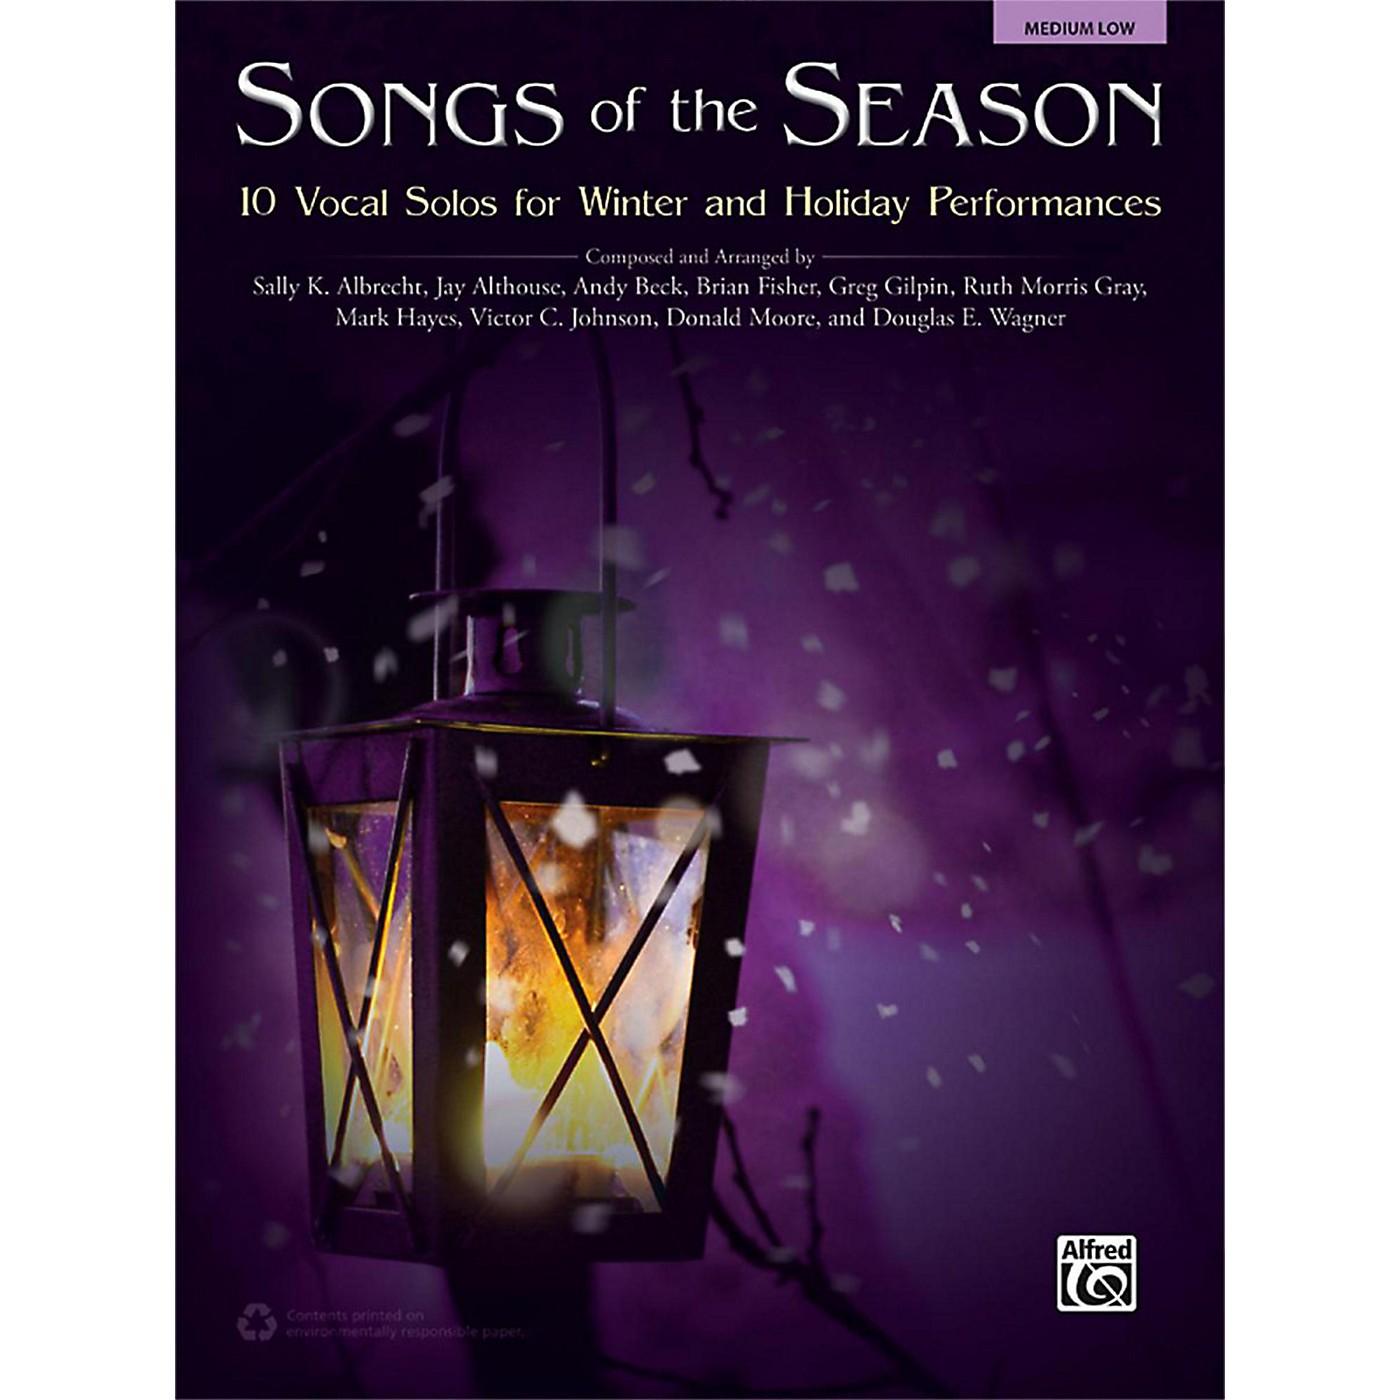 Alfred Songs of the Season Medium Low Book thumbnail